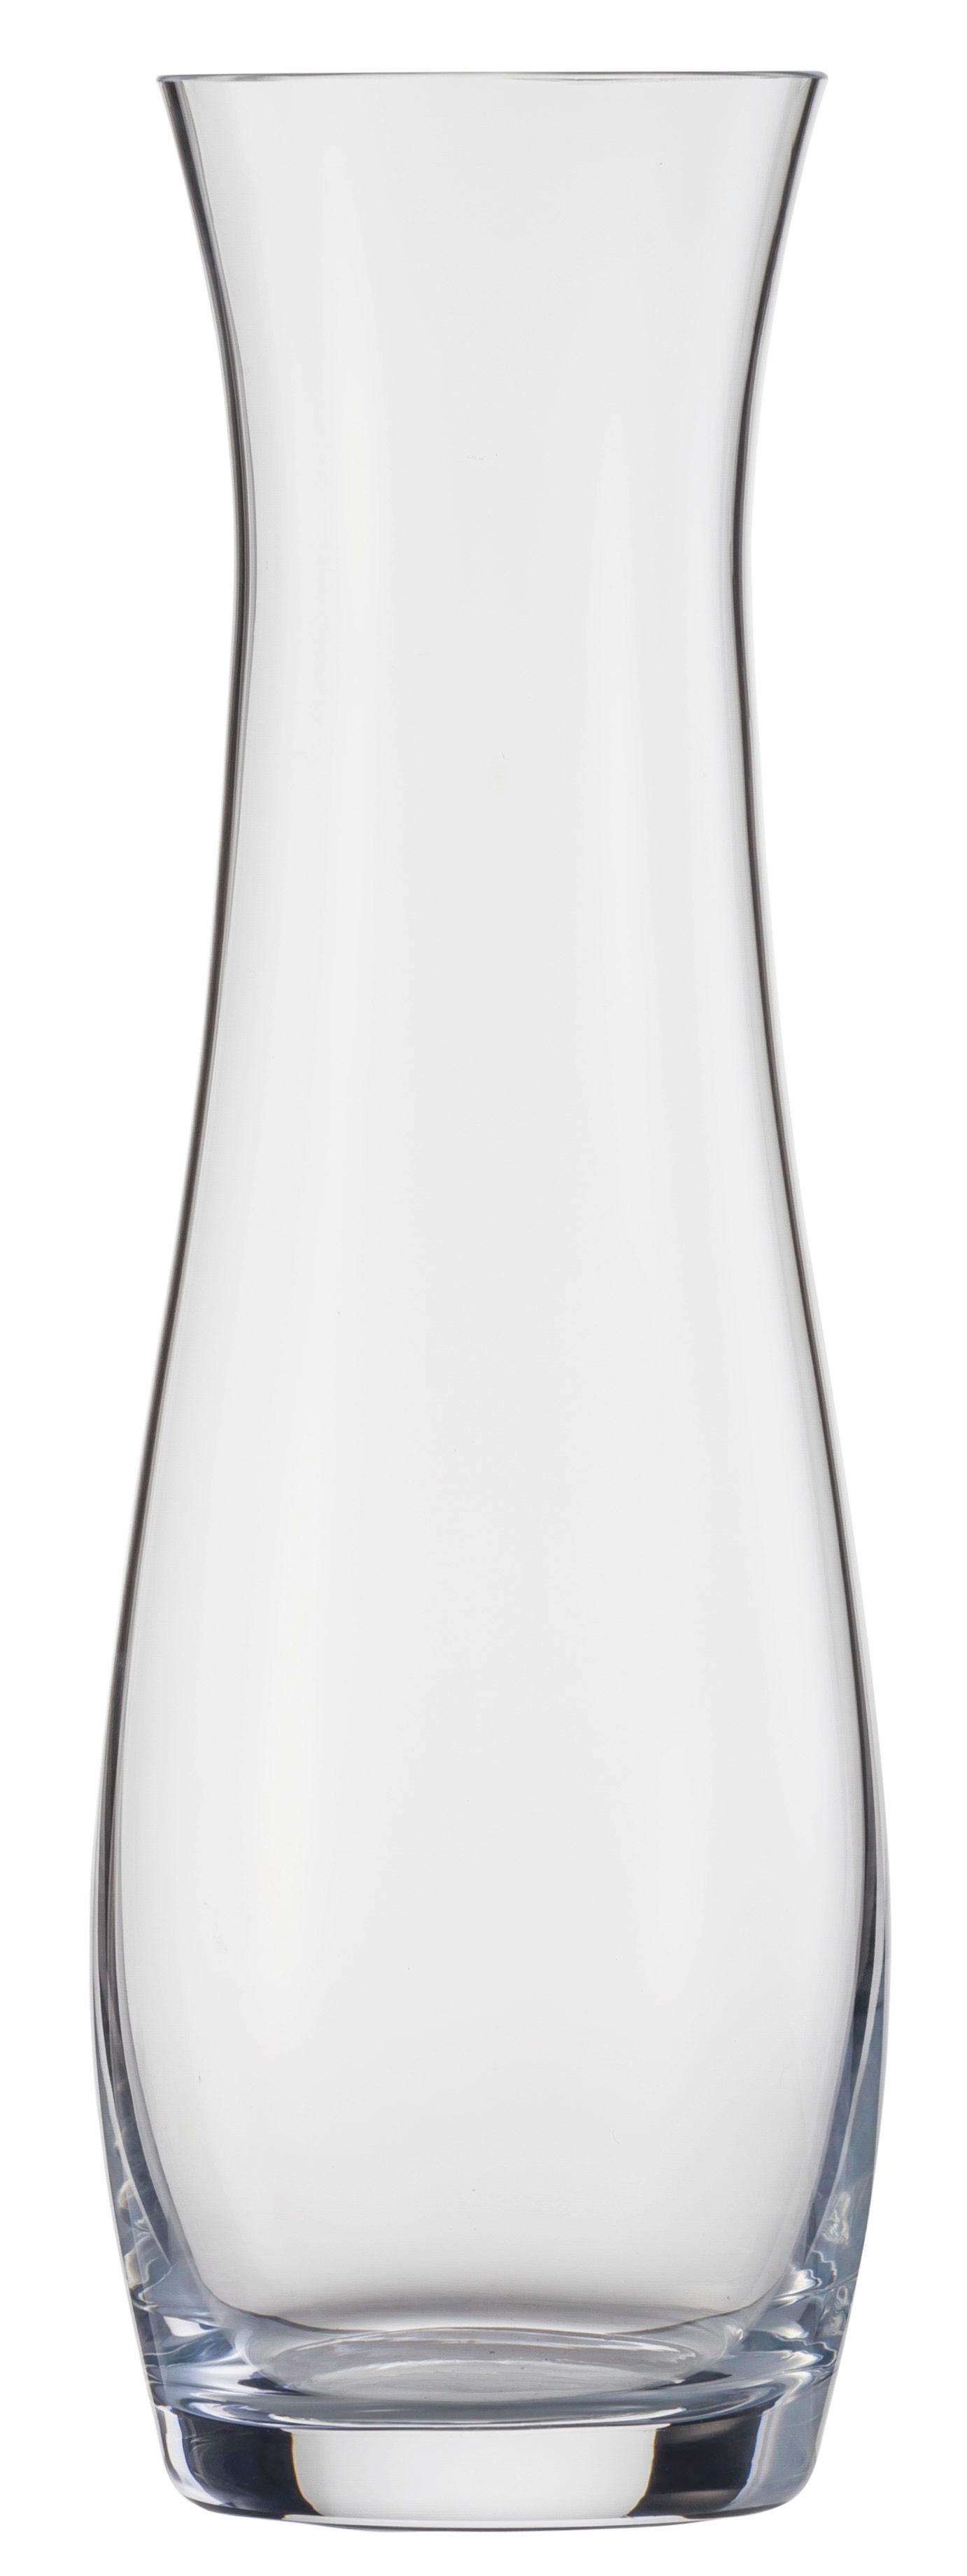 KARAFFE 0,5 L - Klar, Basics, Glas (8,1/24,2cm) - SCHOTT ZWIESEL